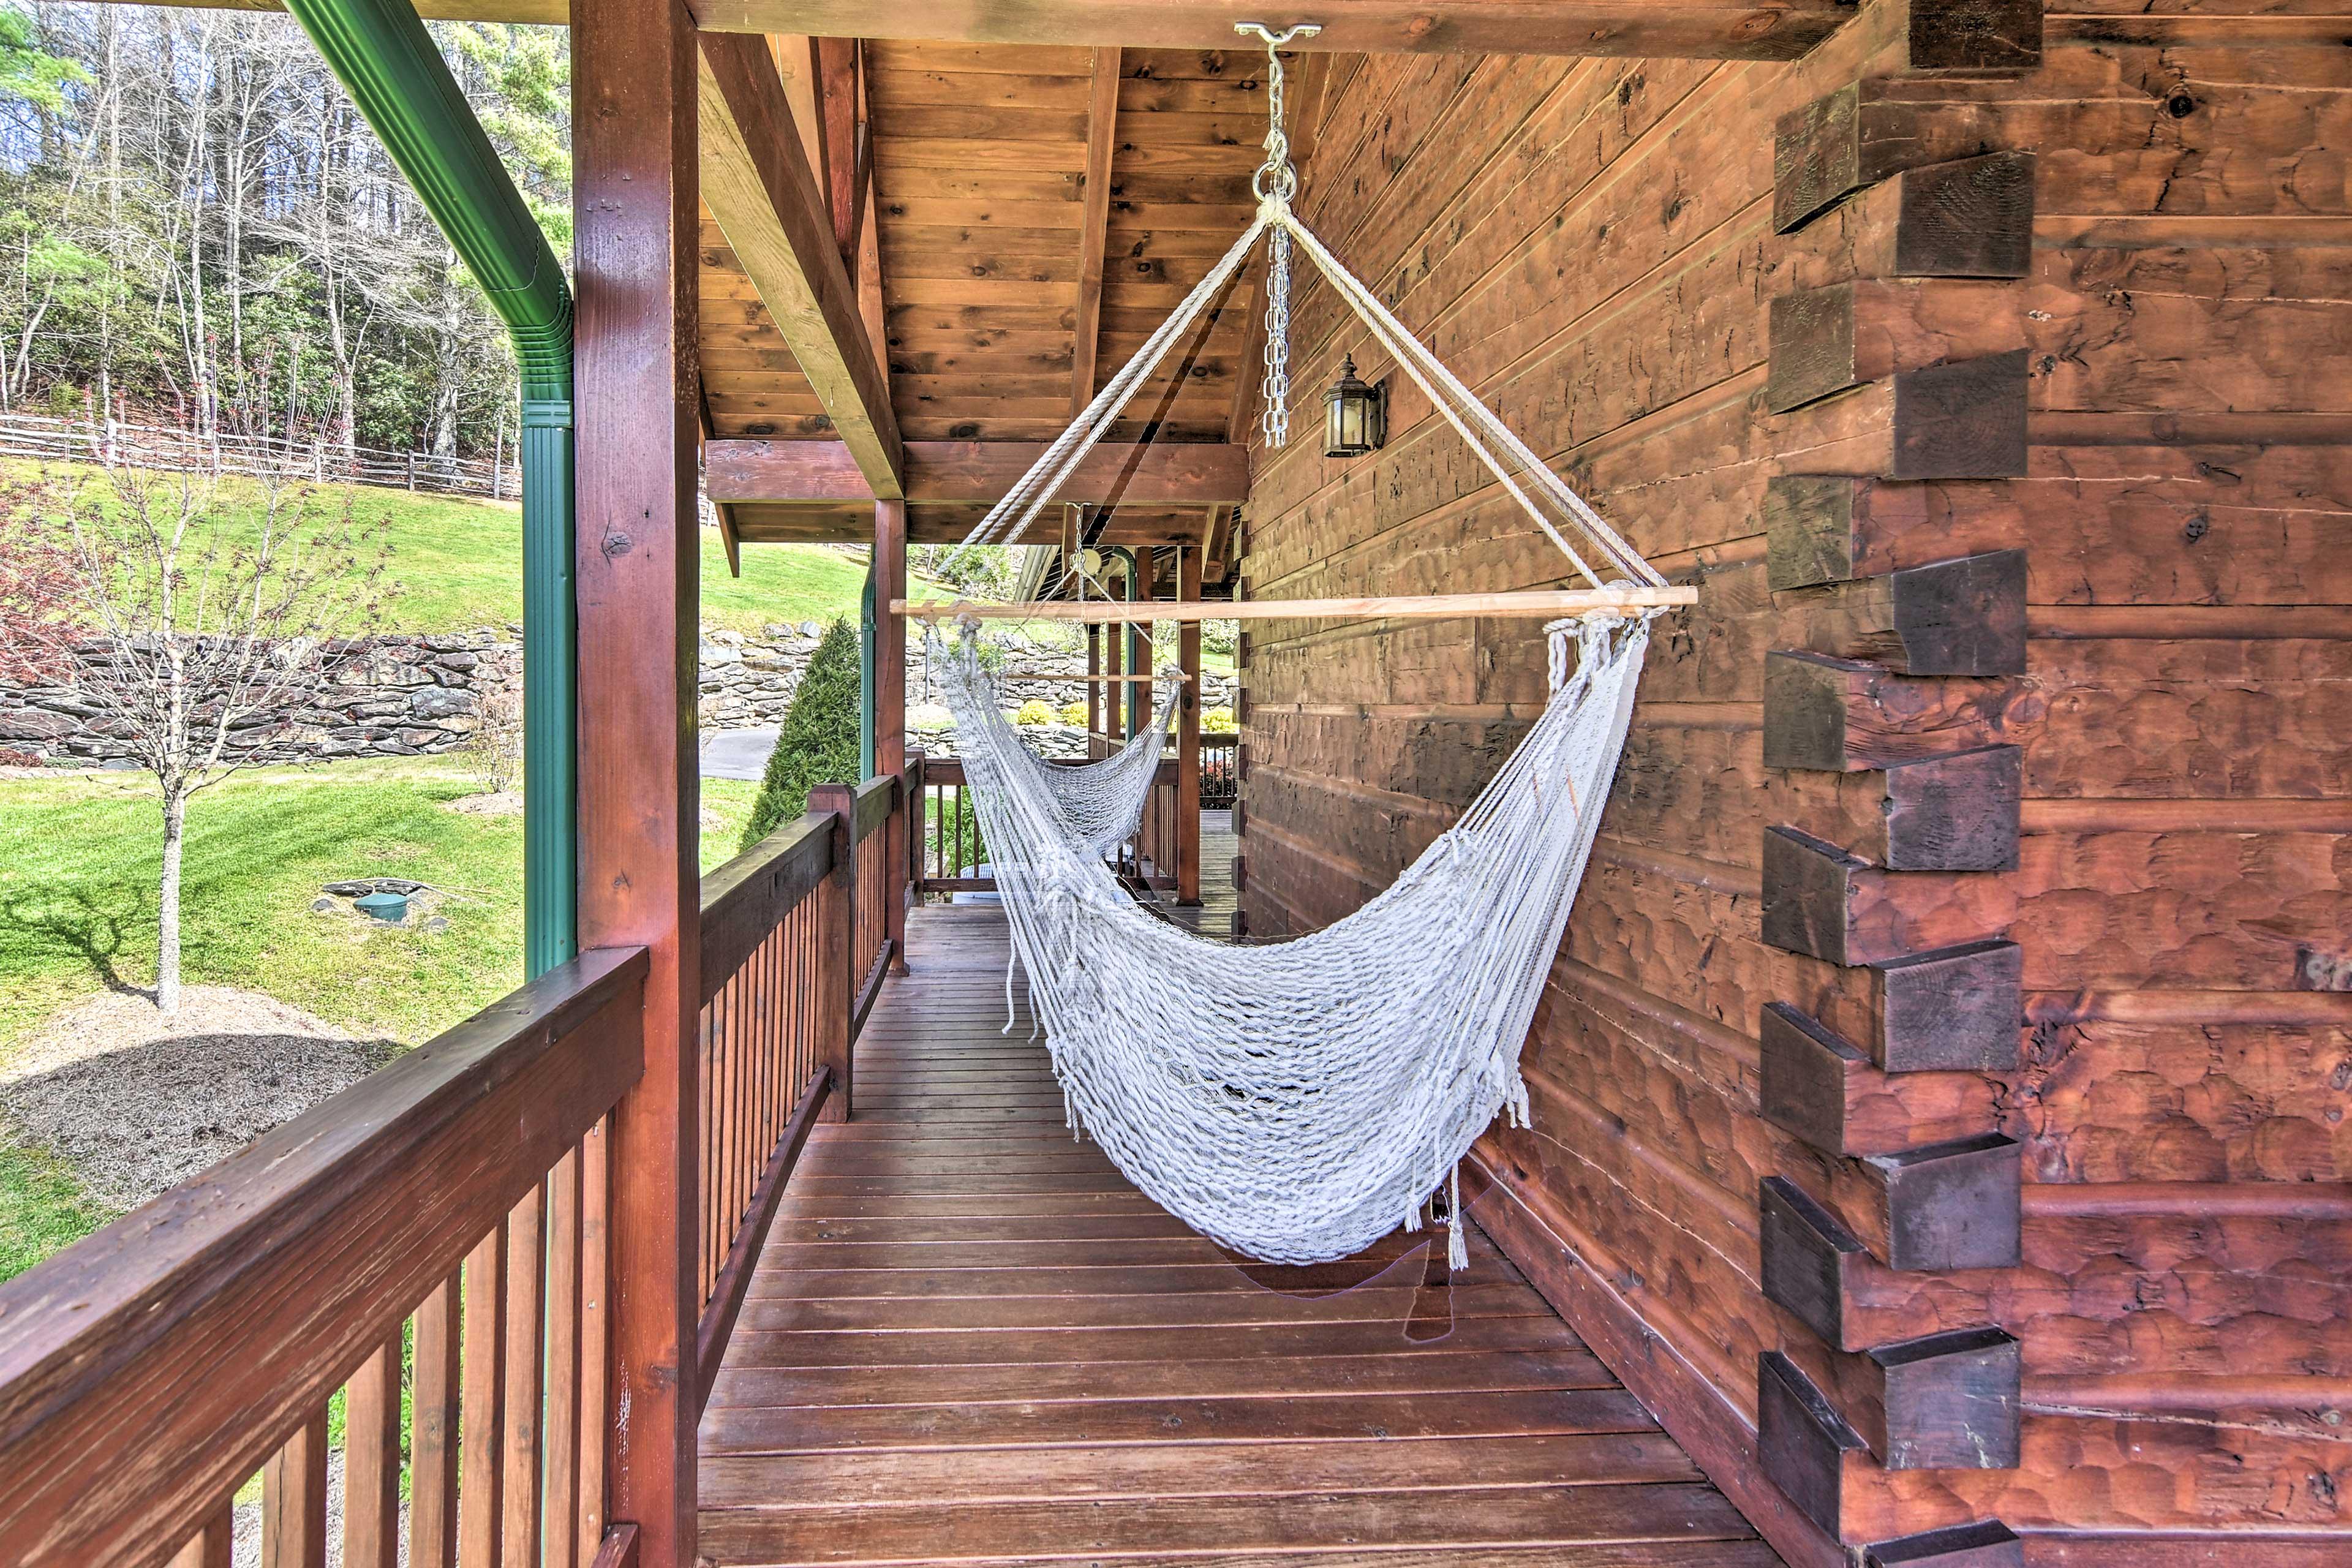 Sway your worries away in the rope hammocks!